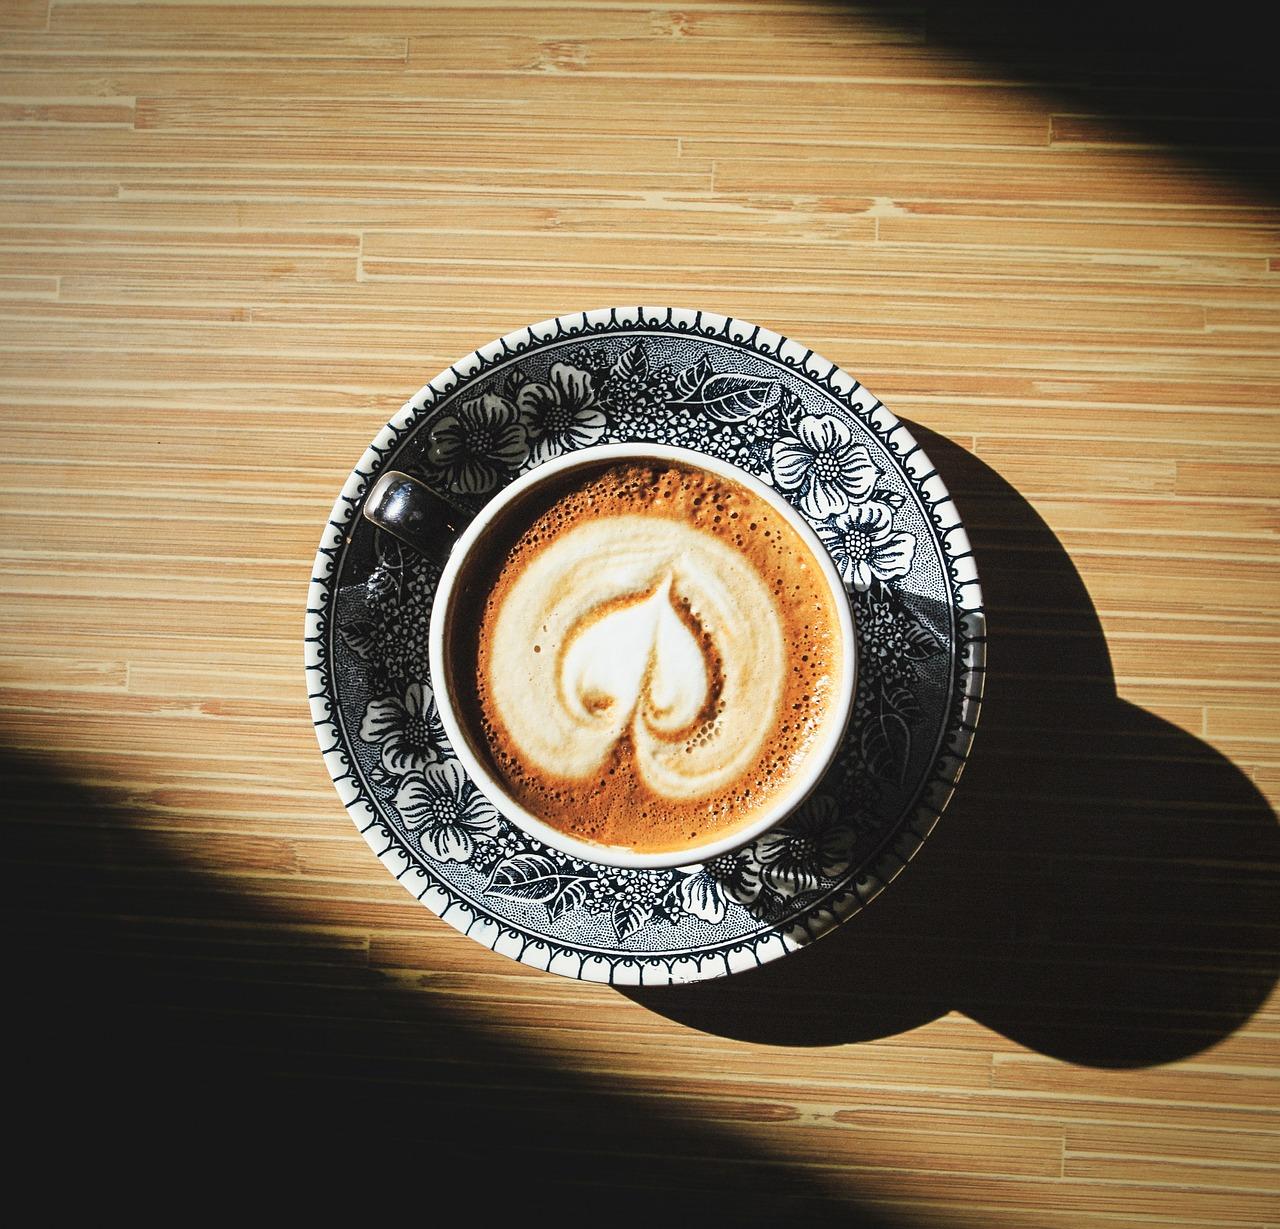 Healthy Dessert Worthy Coffee | YES! Nutrition, LLC | Tori Holthaus, MS, RDN, LD